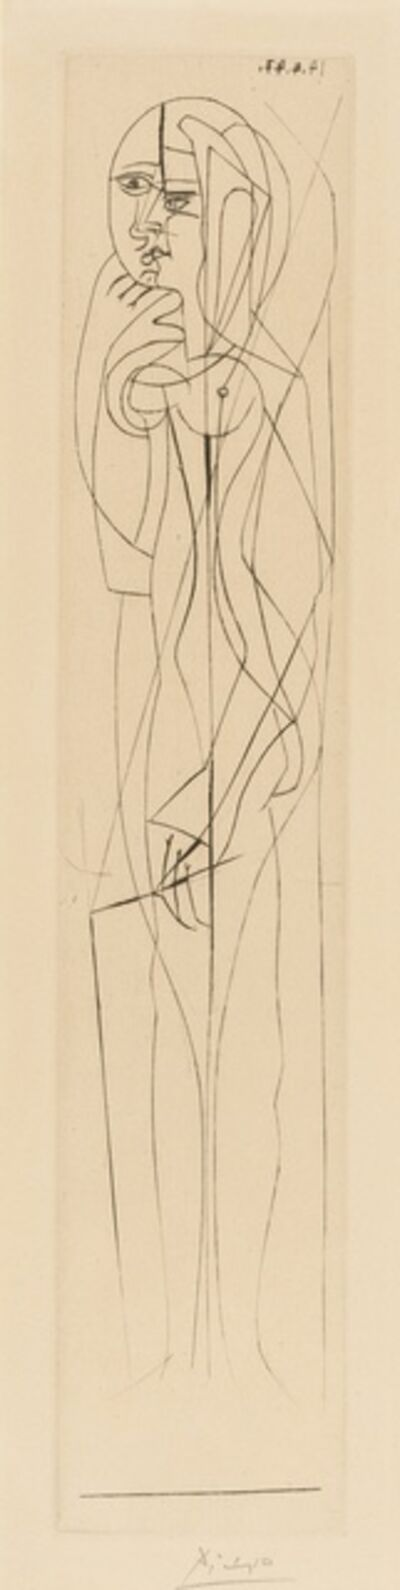 Pablo Picasso, 'Nu de Profil: Garde Gauche (Baer 784Ba; Bloch 463; Cramer Books 48)', 1947